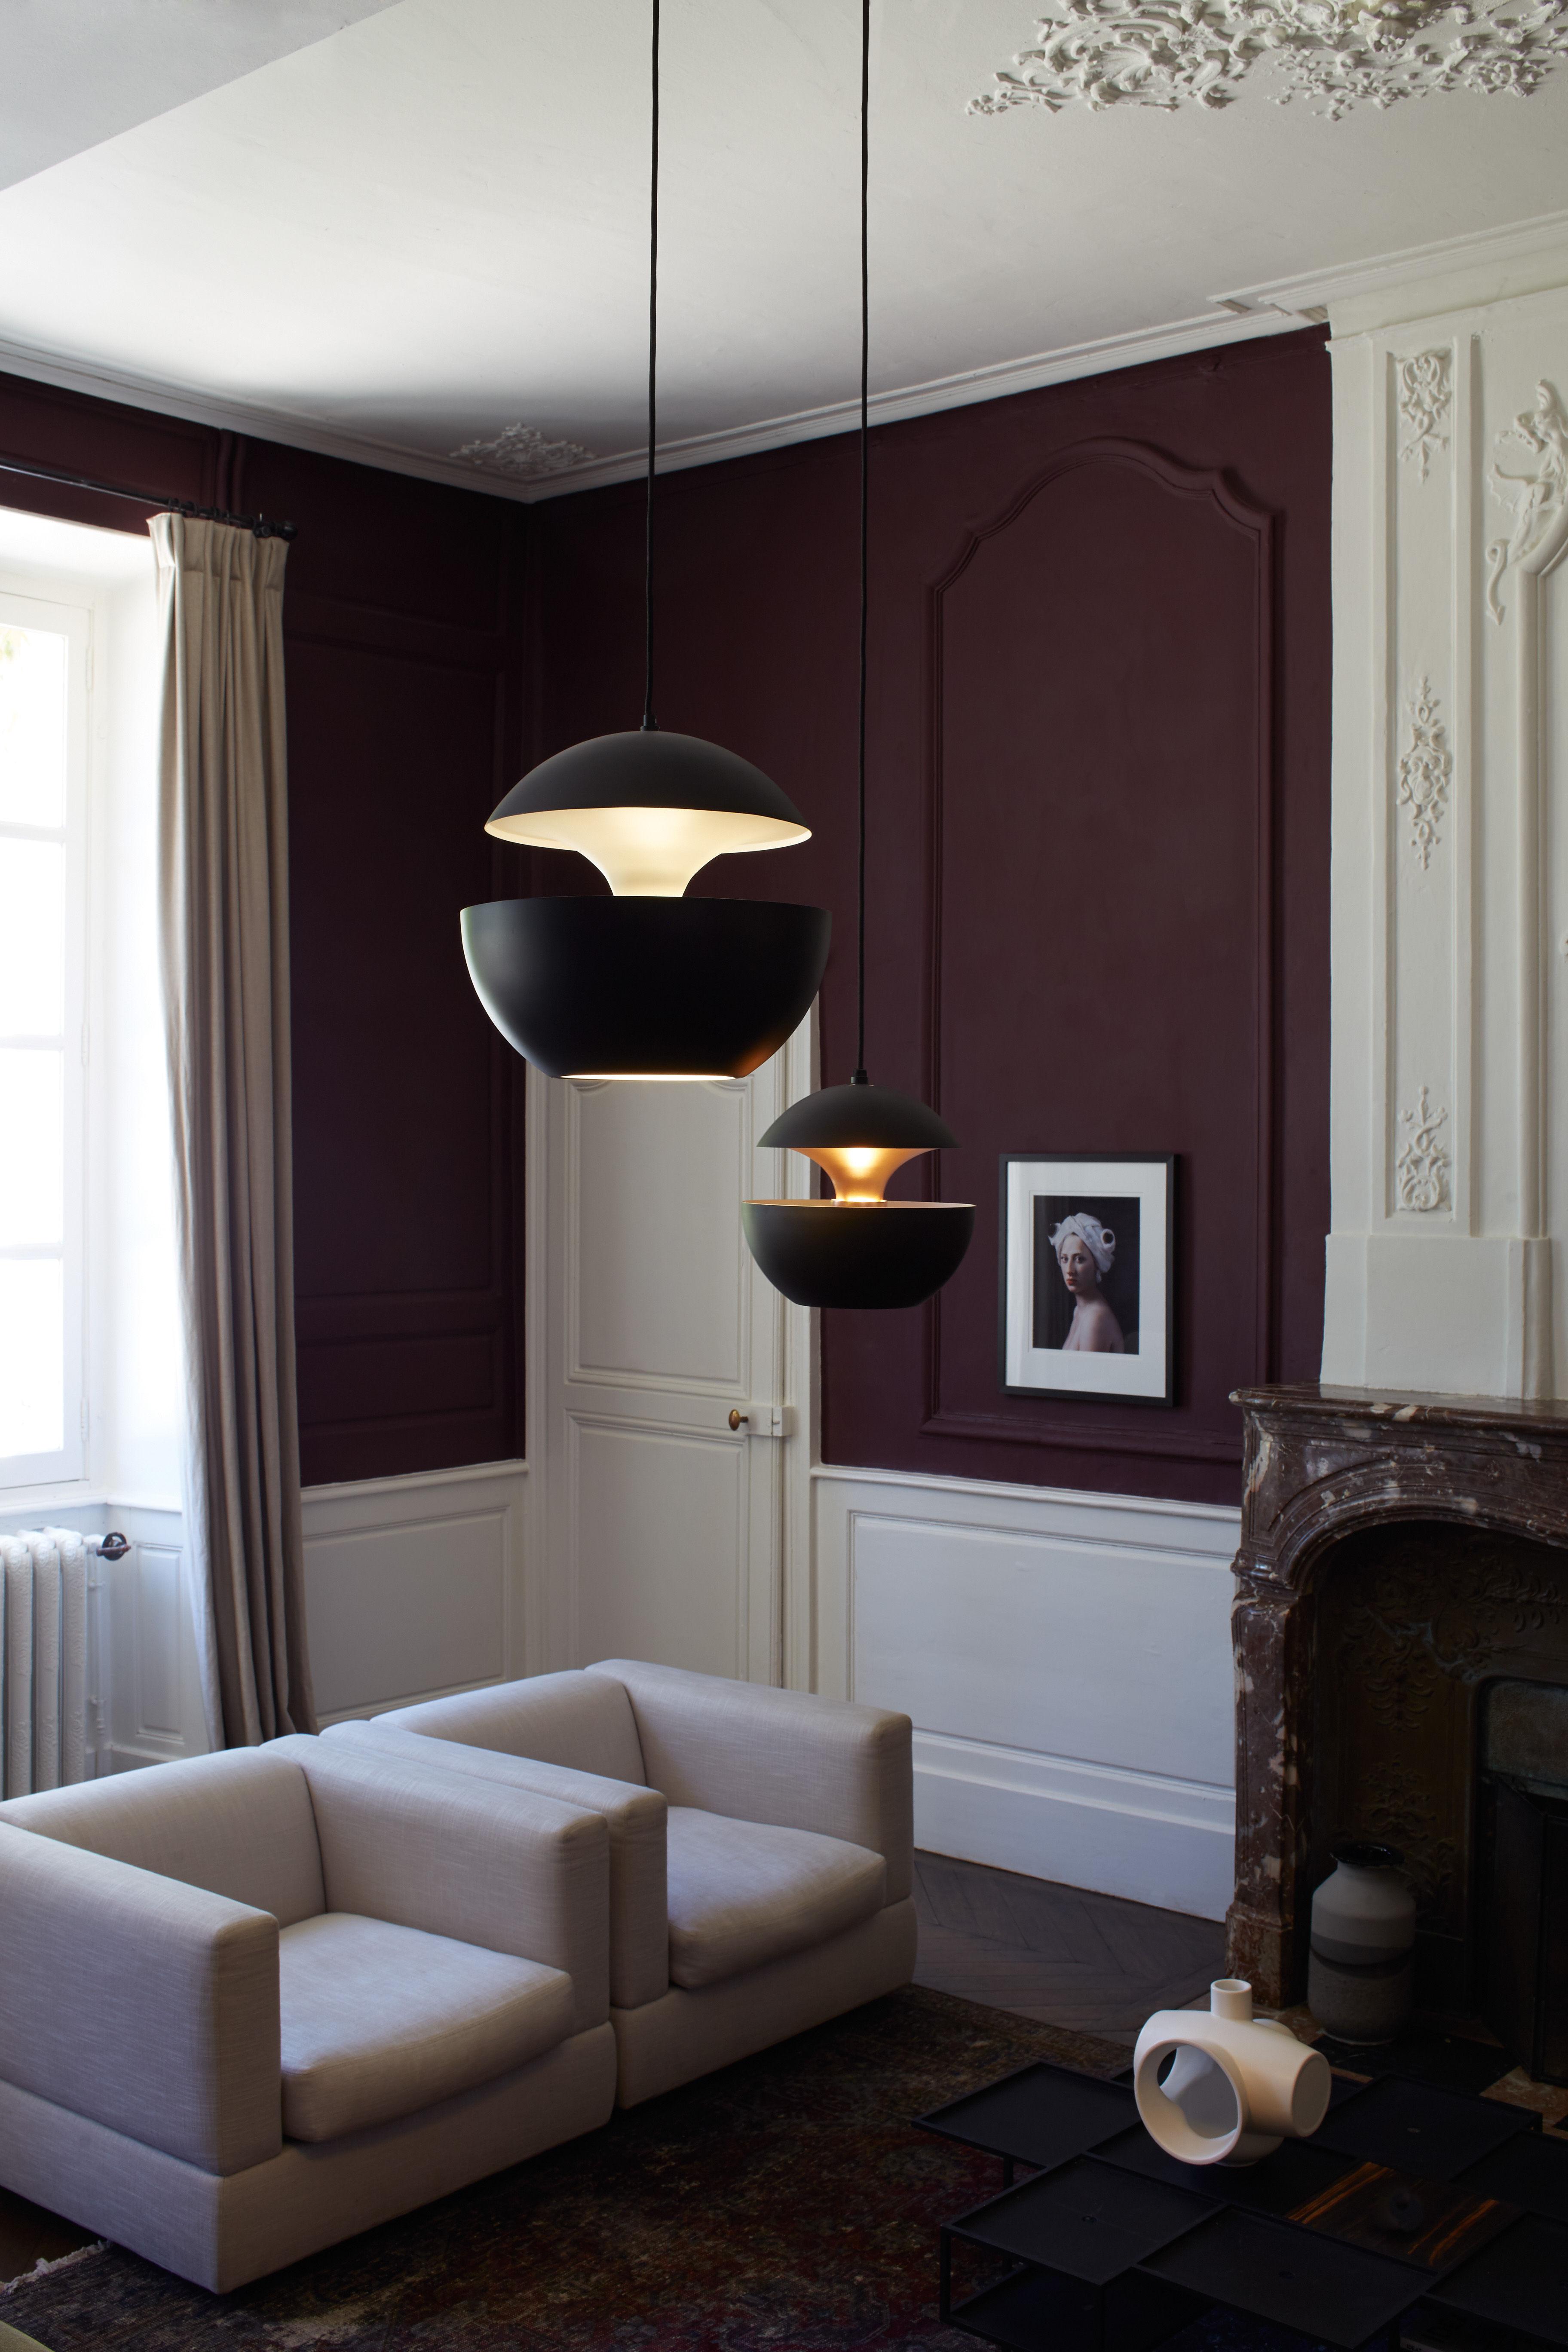 suspension here comes the sun 35 cm r dition 1970 noir int rieur cuivre dcw ditions. Black Bedroom Furniture Sets. Home Design Ideas